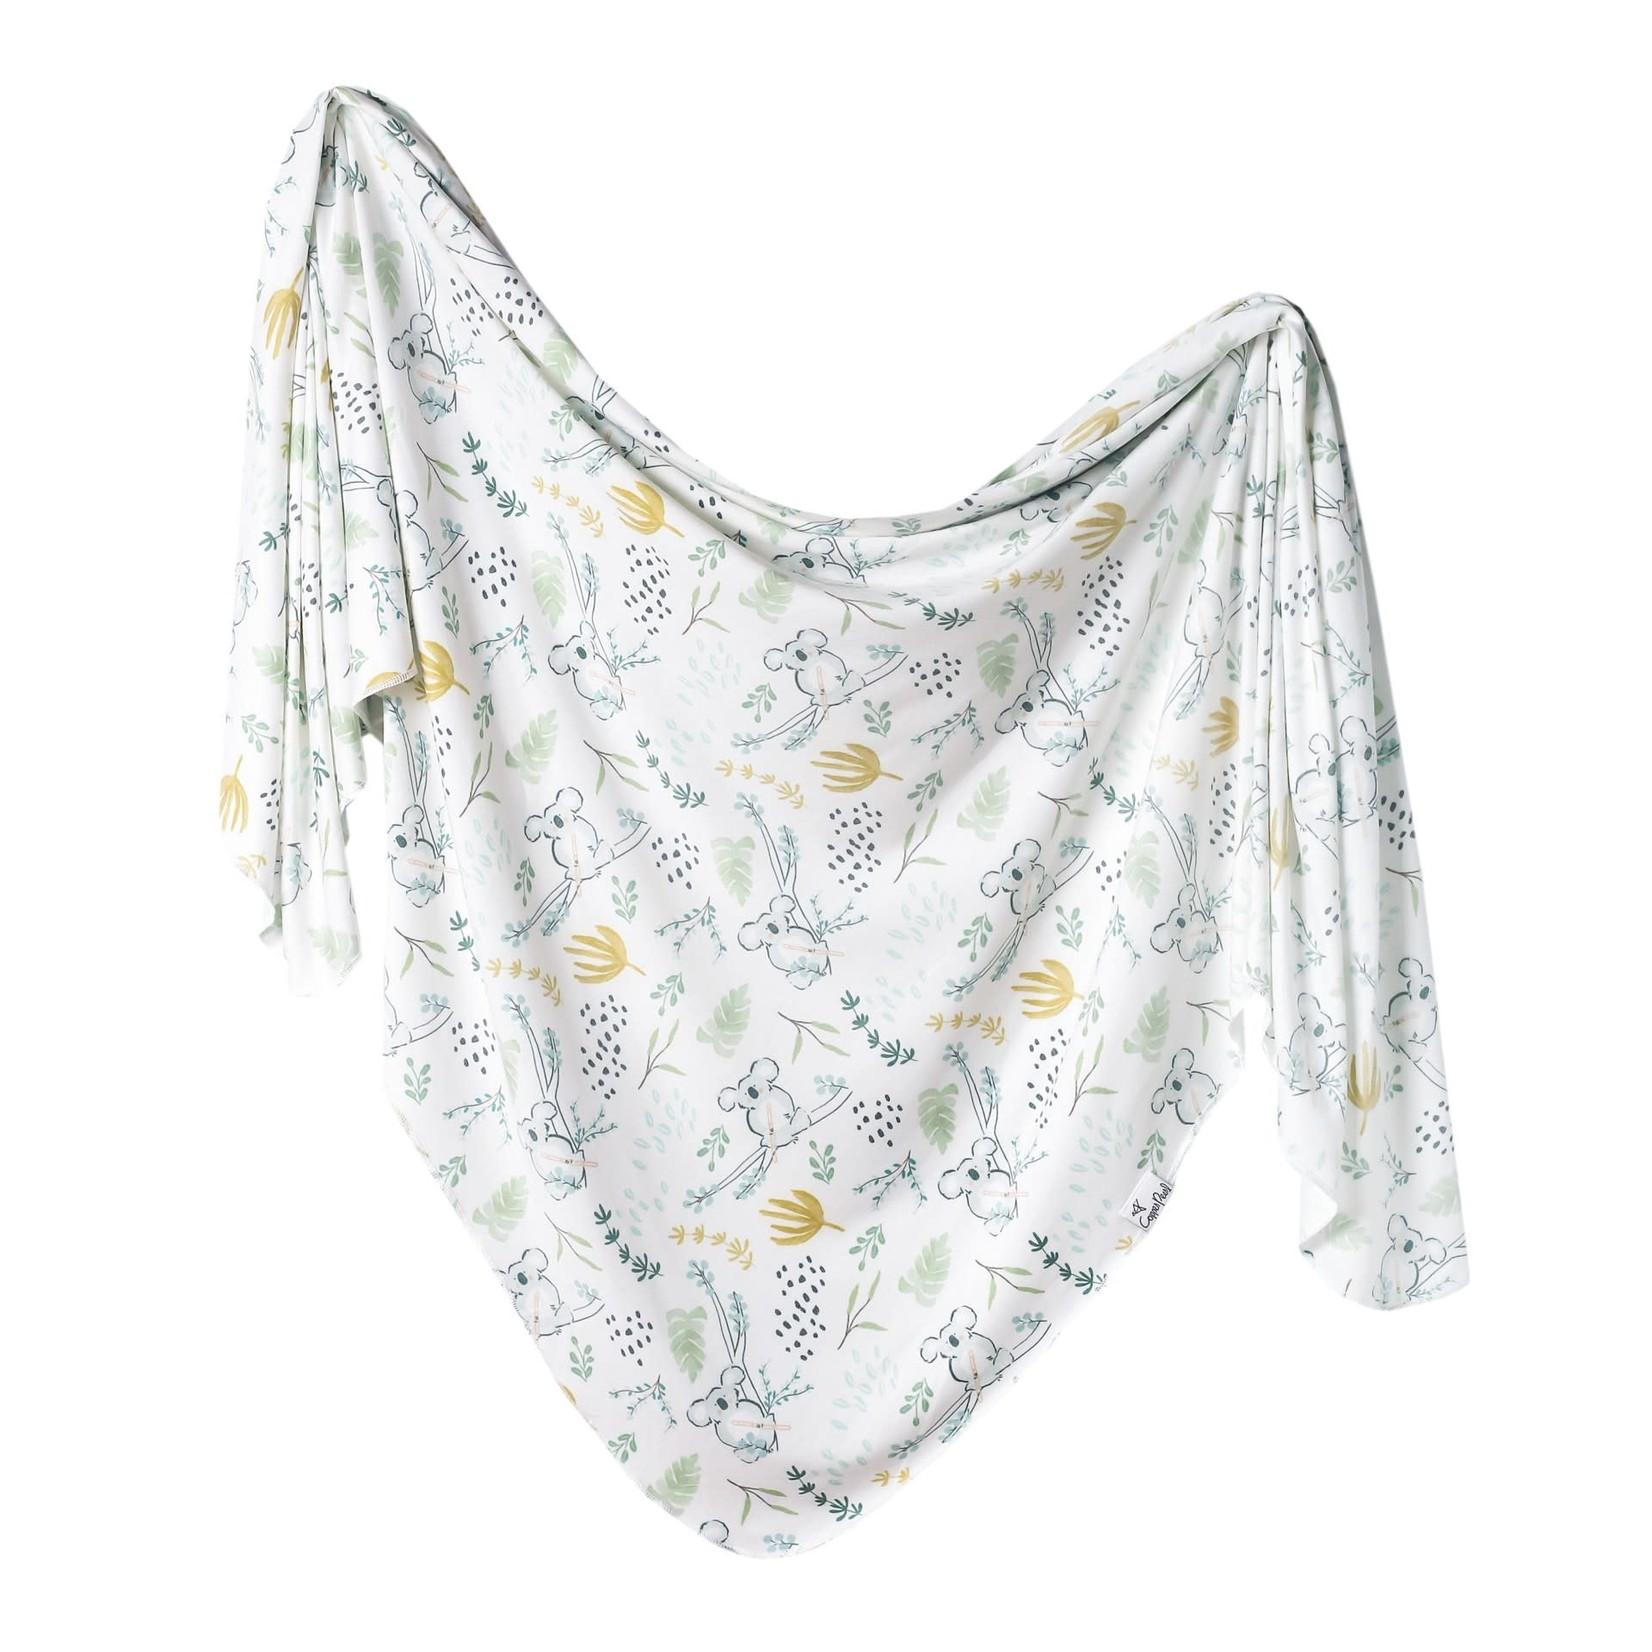 Copper Pearl Knit Blanket - Aussie